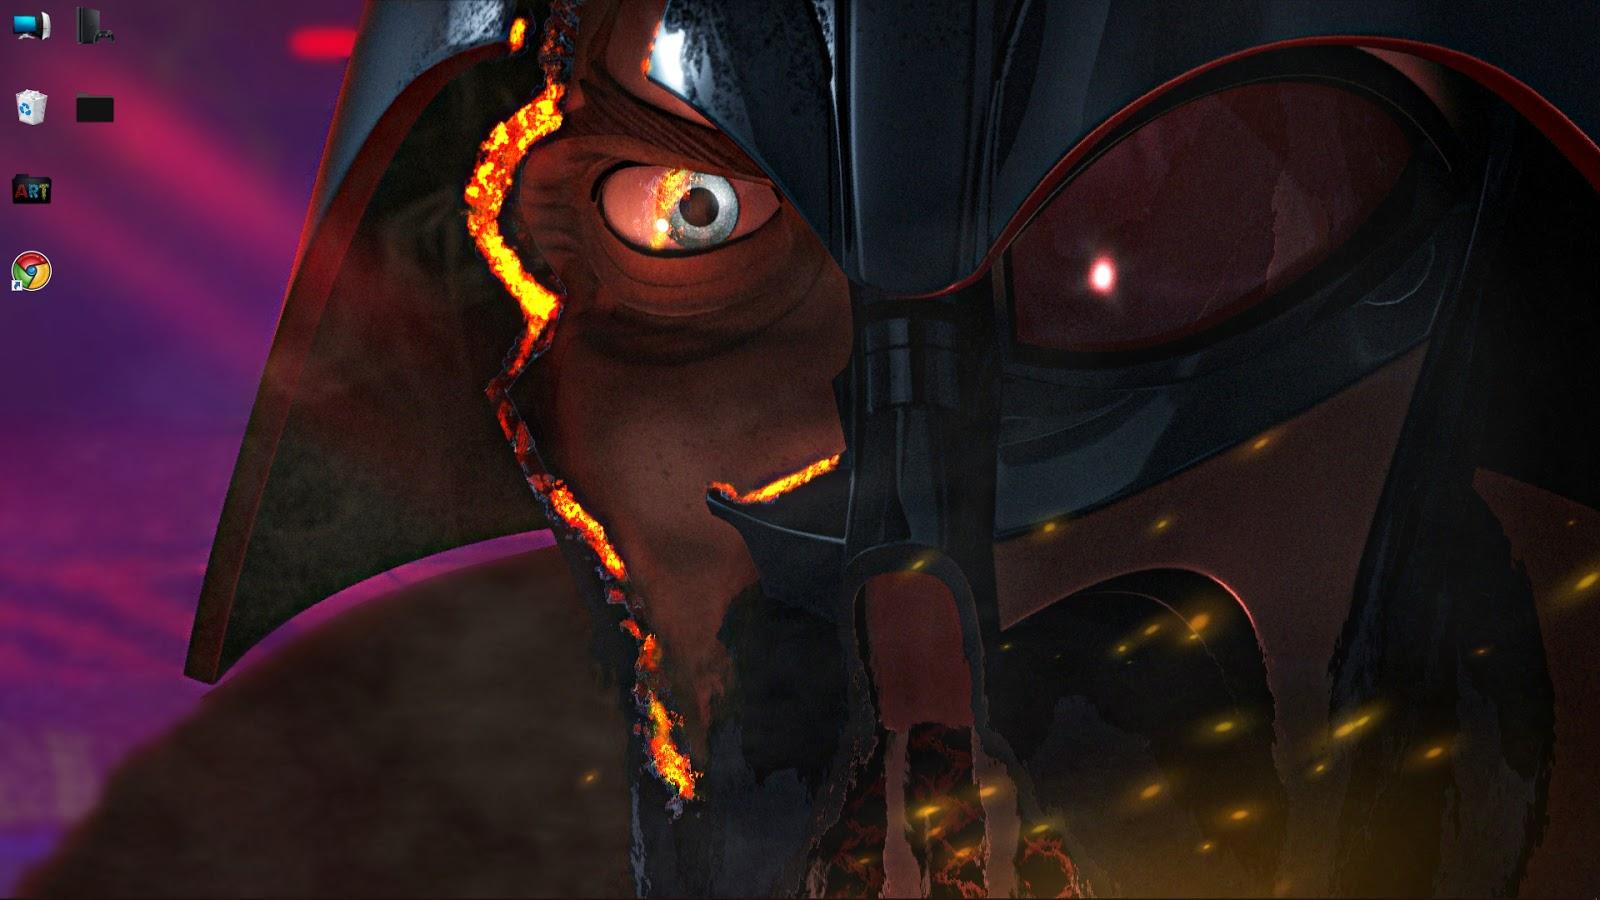 Wallpaper Engine Wallpaper Engine Darth Vader Broken Helmet Free Download